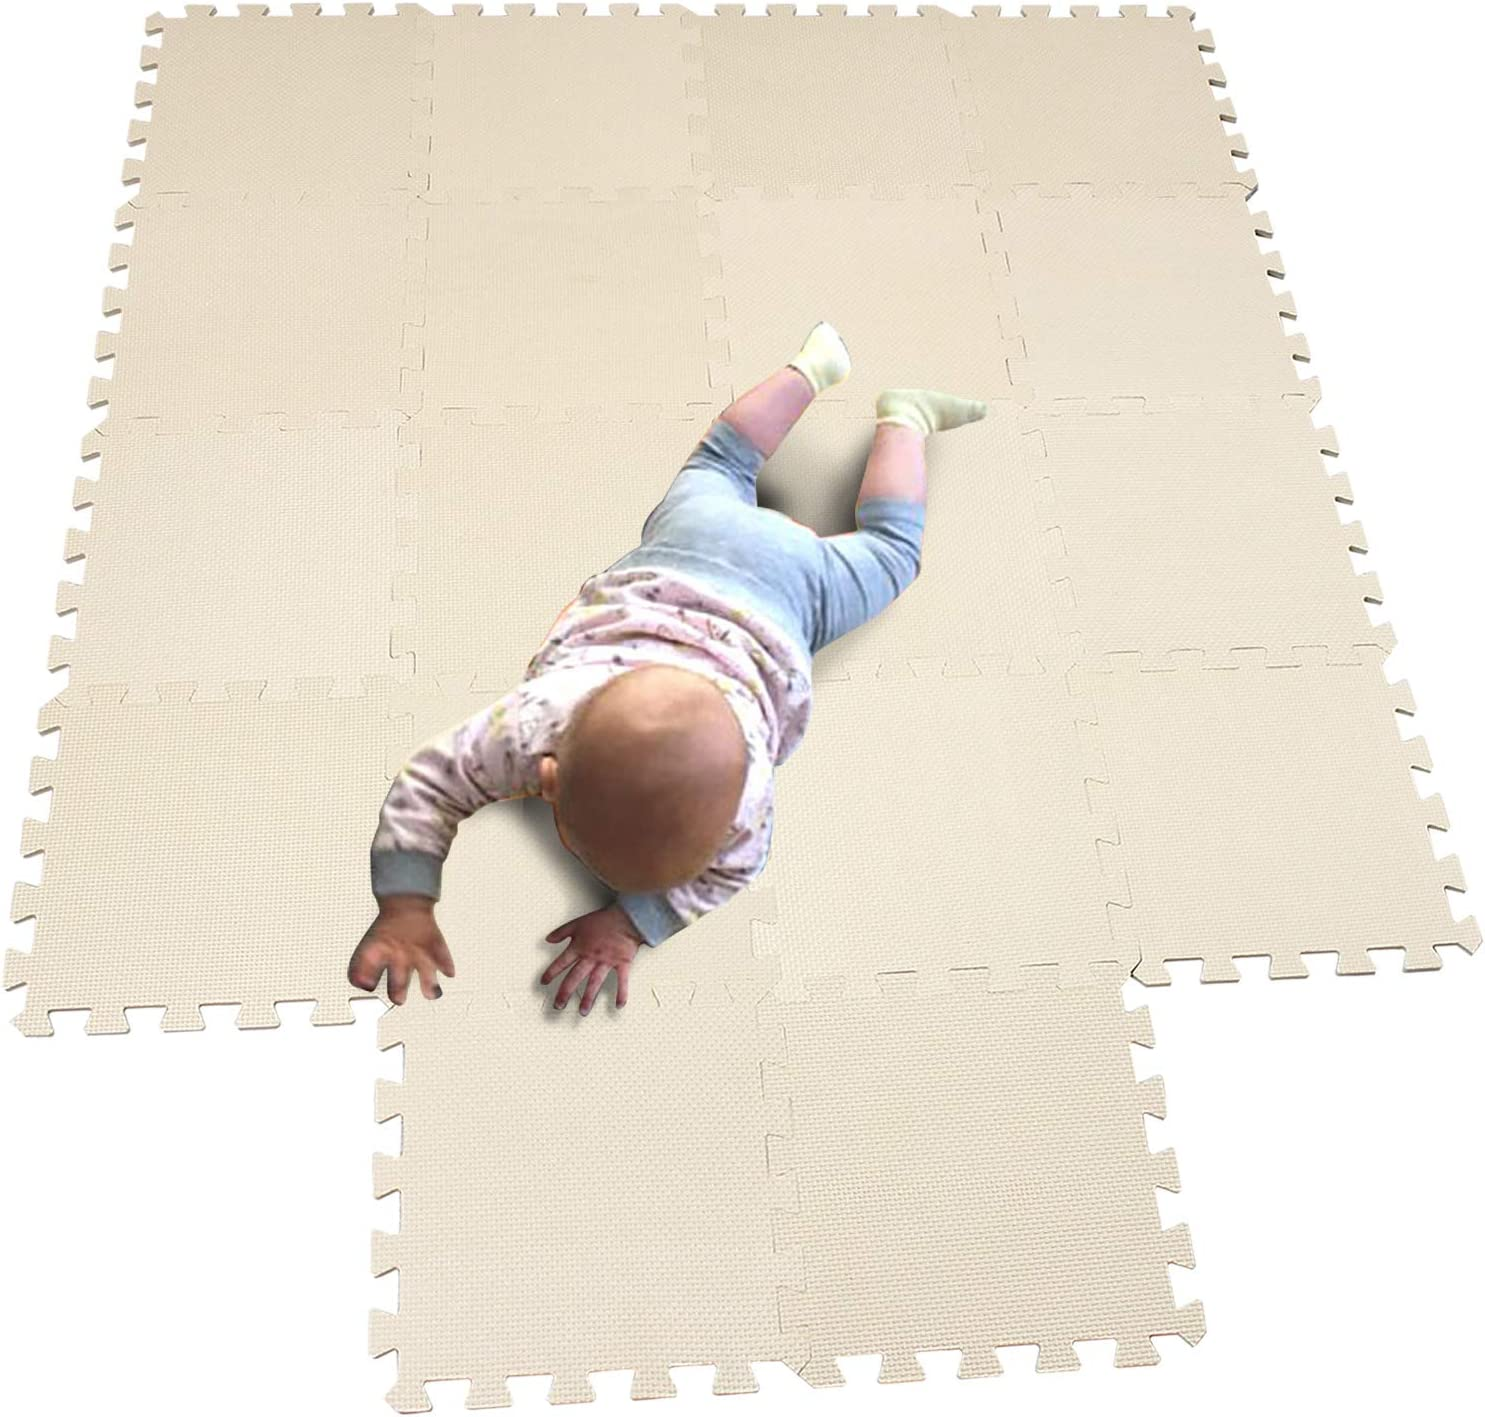 MQIAOHAM 18 pieces Tapis dentrainement Protections sol Tapis de fitness Gymnastique Beige 110